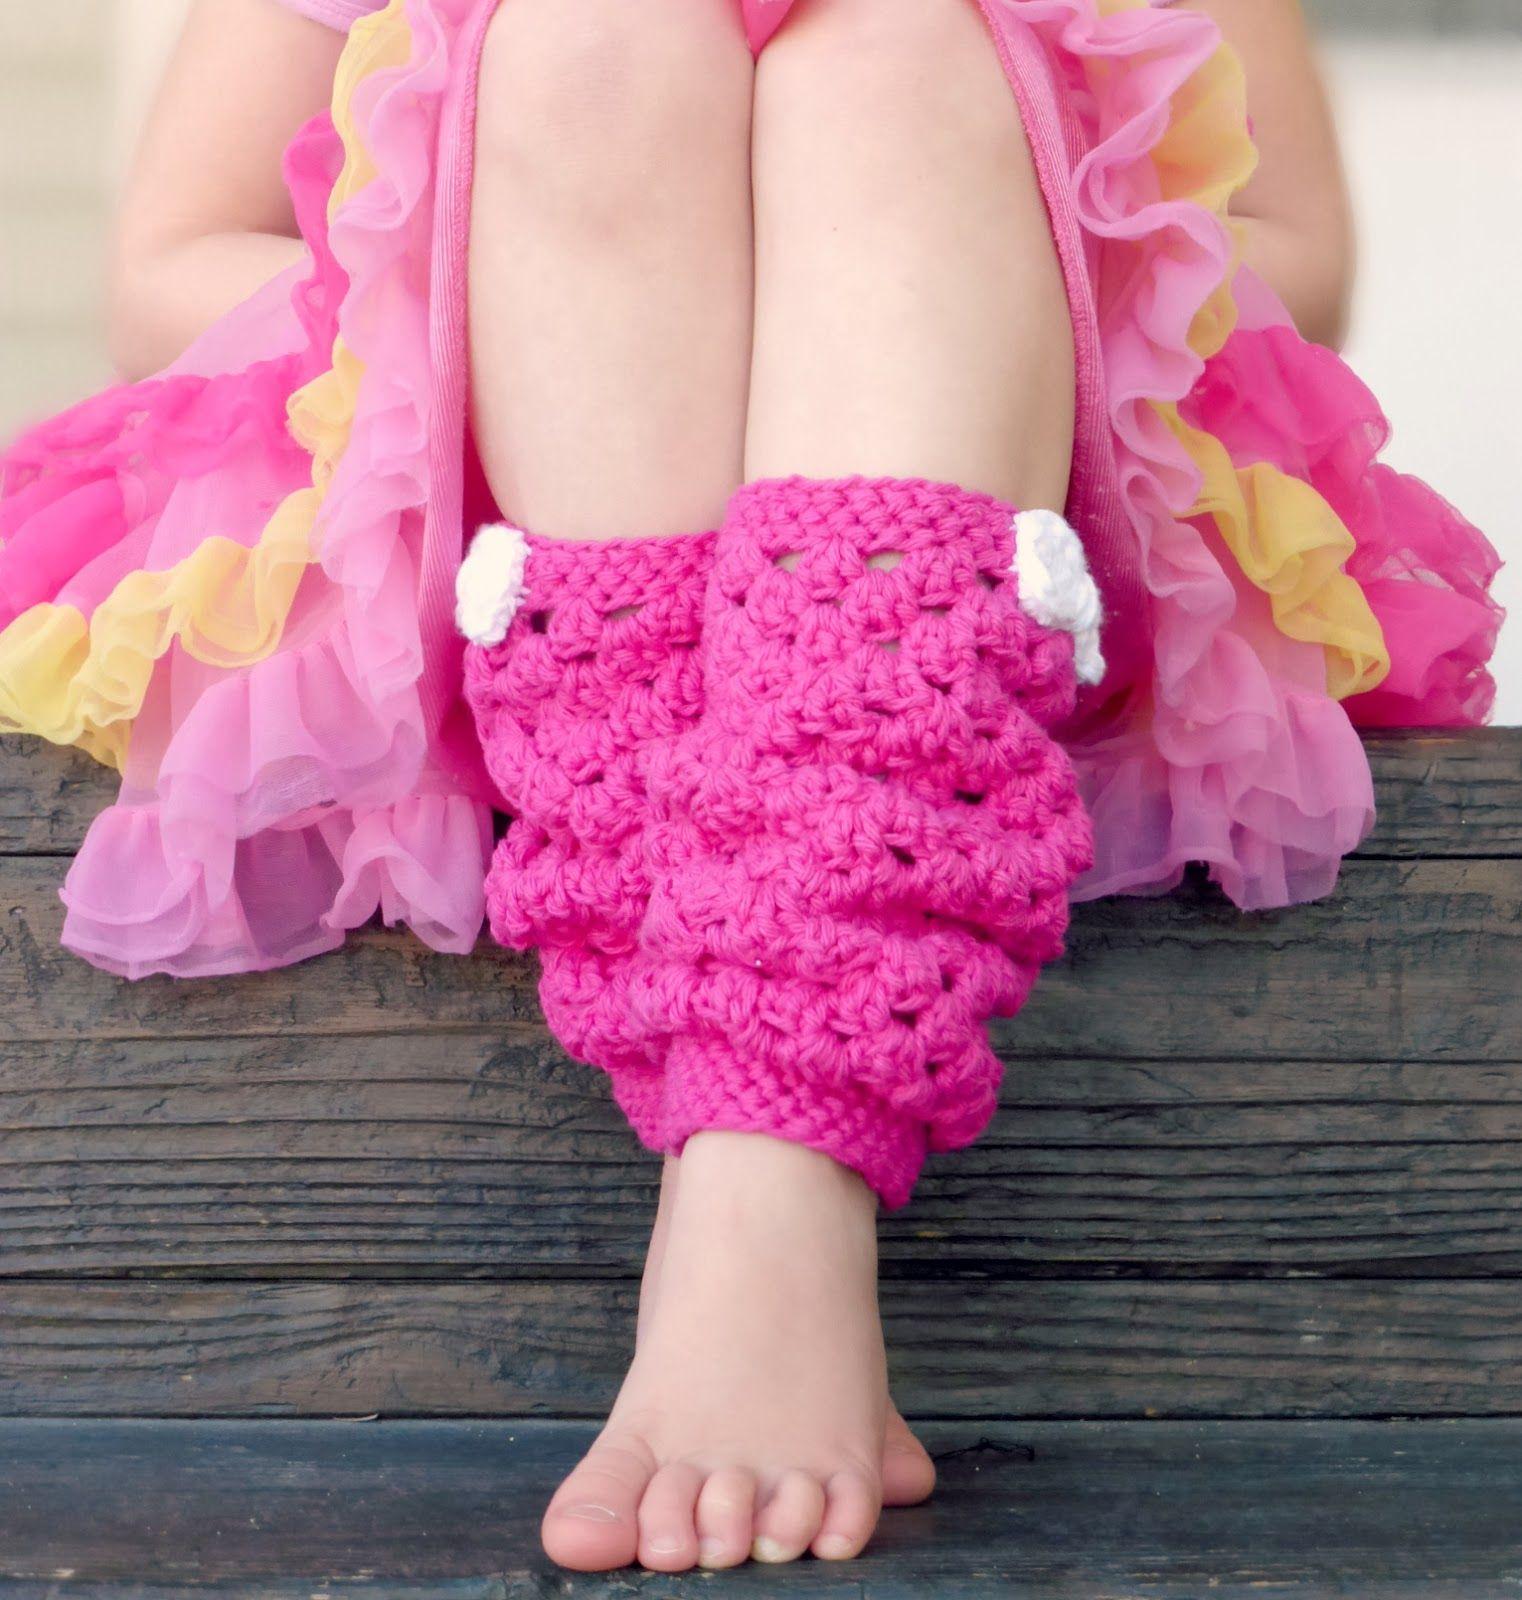 Crochet leg warmers girly leg warmers free crochet pattern and crochet leg warmers girly leg warmers free crochet pattern and a matching doll leg bankloansurffo Choice Image